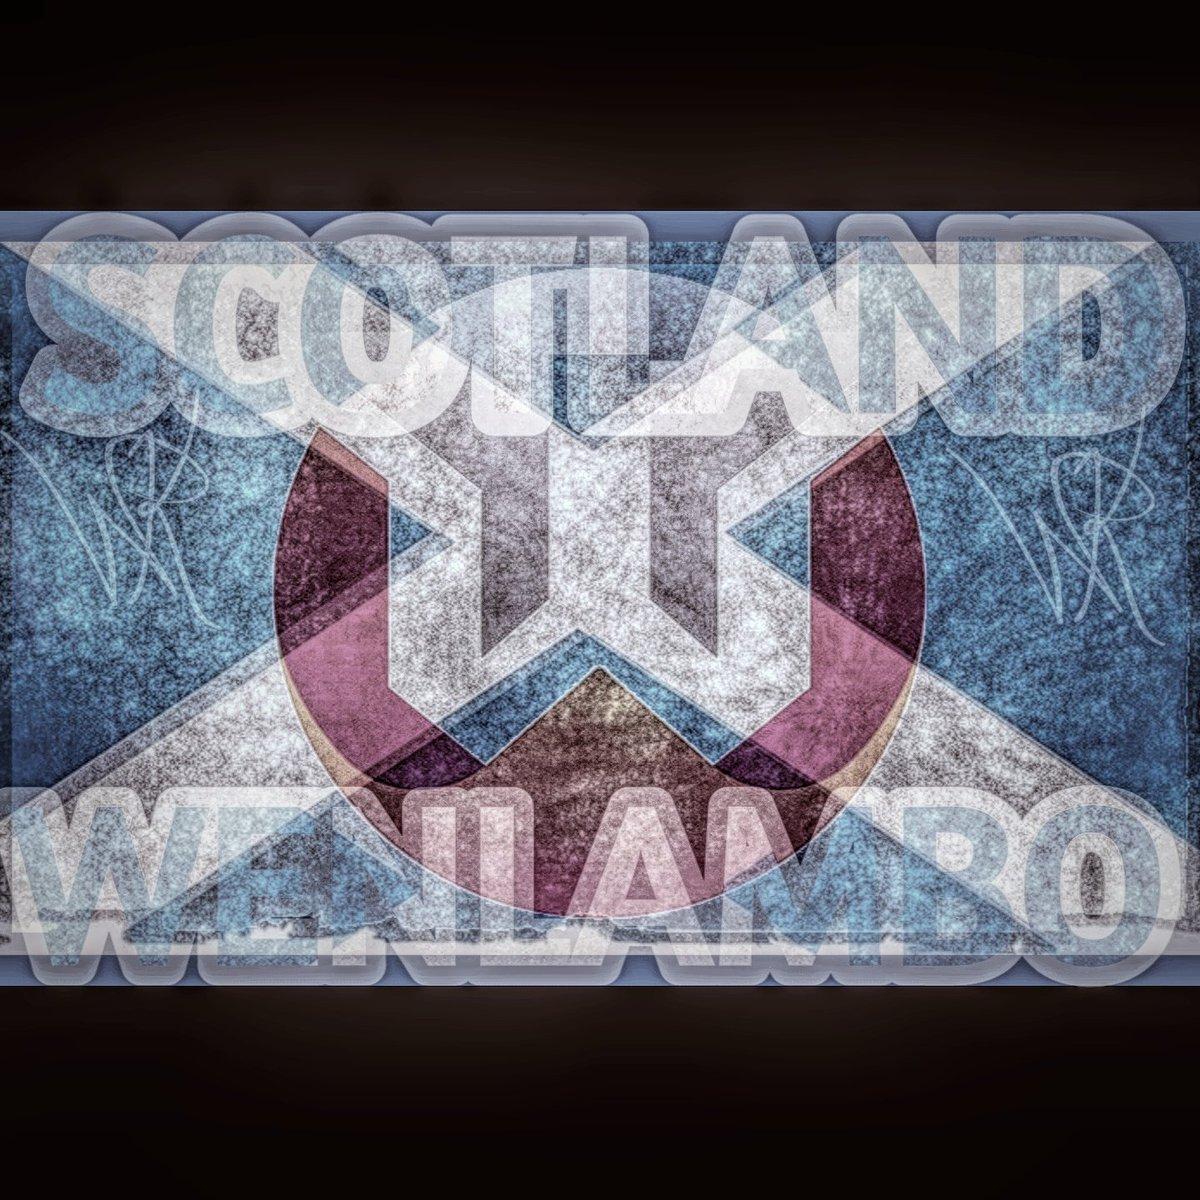 @Bsc100x_gems @LiamCar90474698 @WenLamboDeFi Good luck Scotland 2night hopefully be a great game  ⚽️ @ScotlandNT @DesignsWkd @football @EURO2020 #btc #vet #cake #SAFEMOON #SAFEMARS #ETH #Doge #xlm #luna #asia #China #america @DesignsWkd @WenLamboDeFi #nftart #DeFi #NFTCommunity #NFTs #NFTGATE #nftcollector #NFTartists #NFT https://t.co/FXxyP4Xxvk